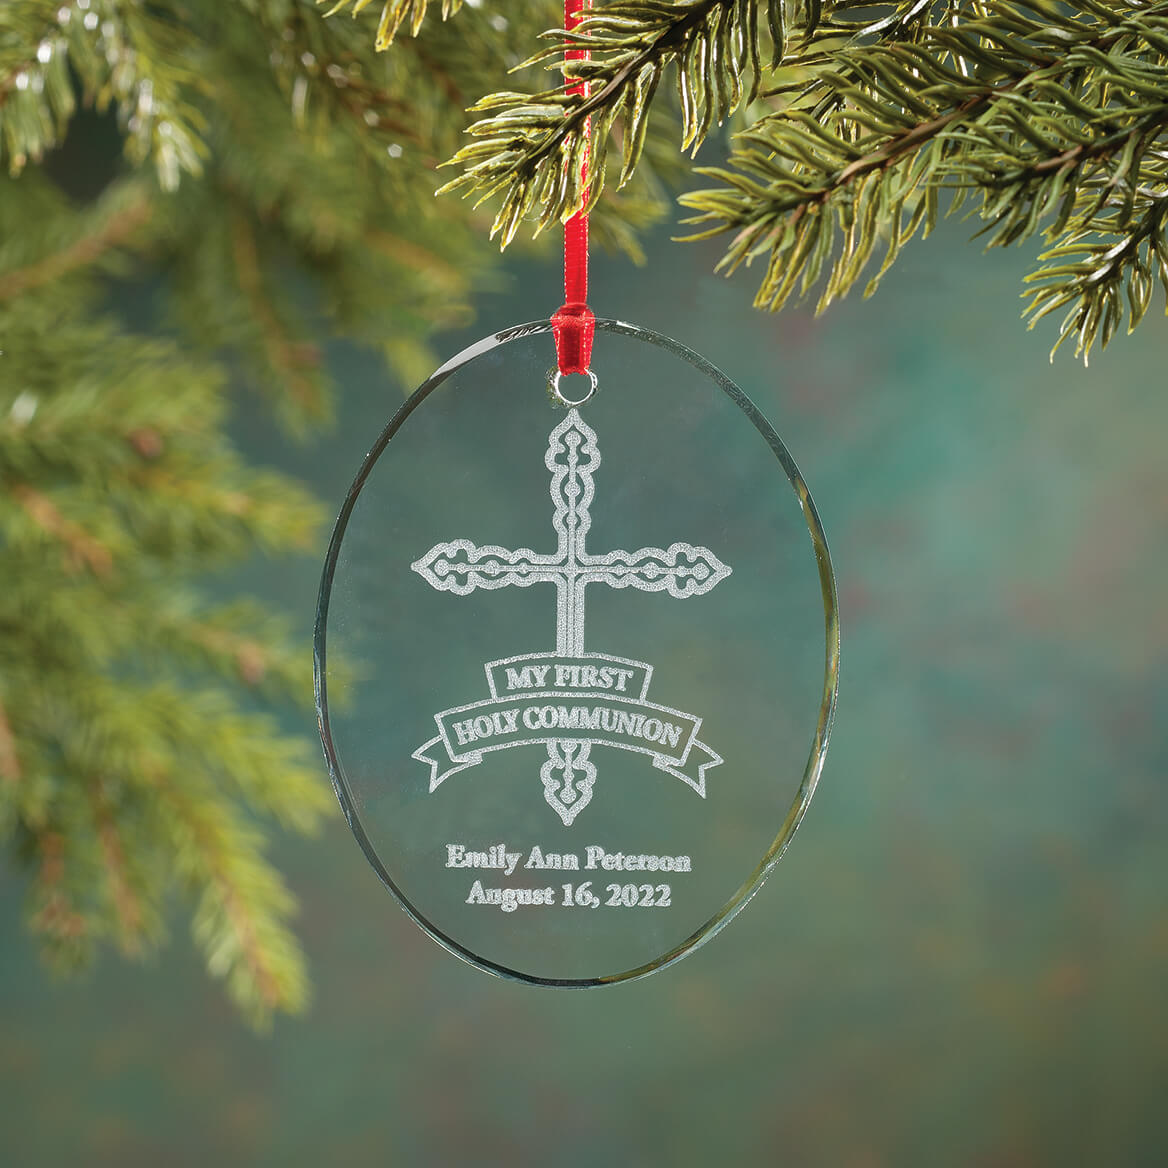 Personalized Glass Communion Ornament-349933